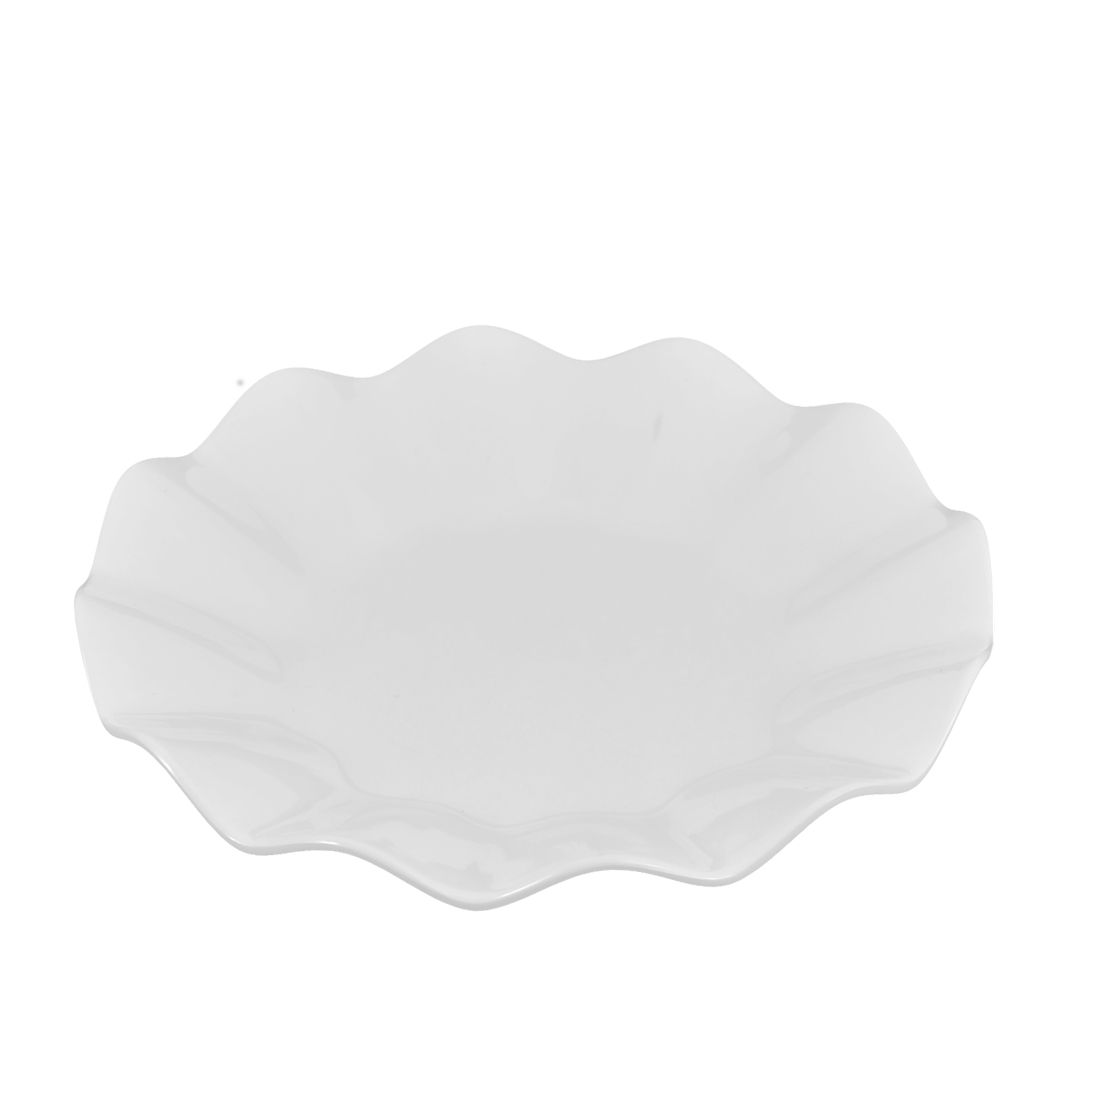 Wavy Edge Plastic Food Appetizer Dessert Cake Dish Plate Container White